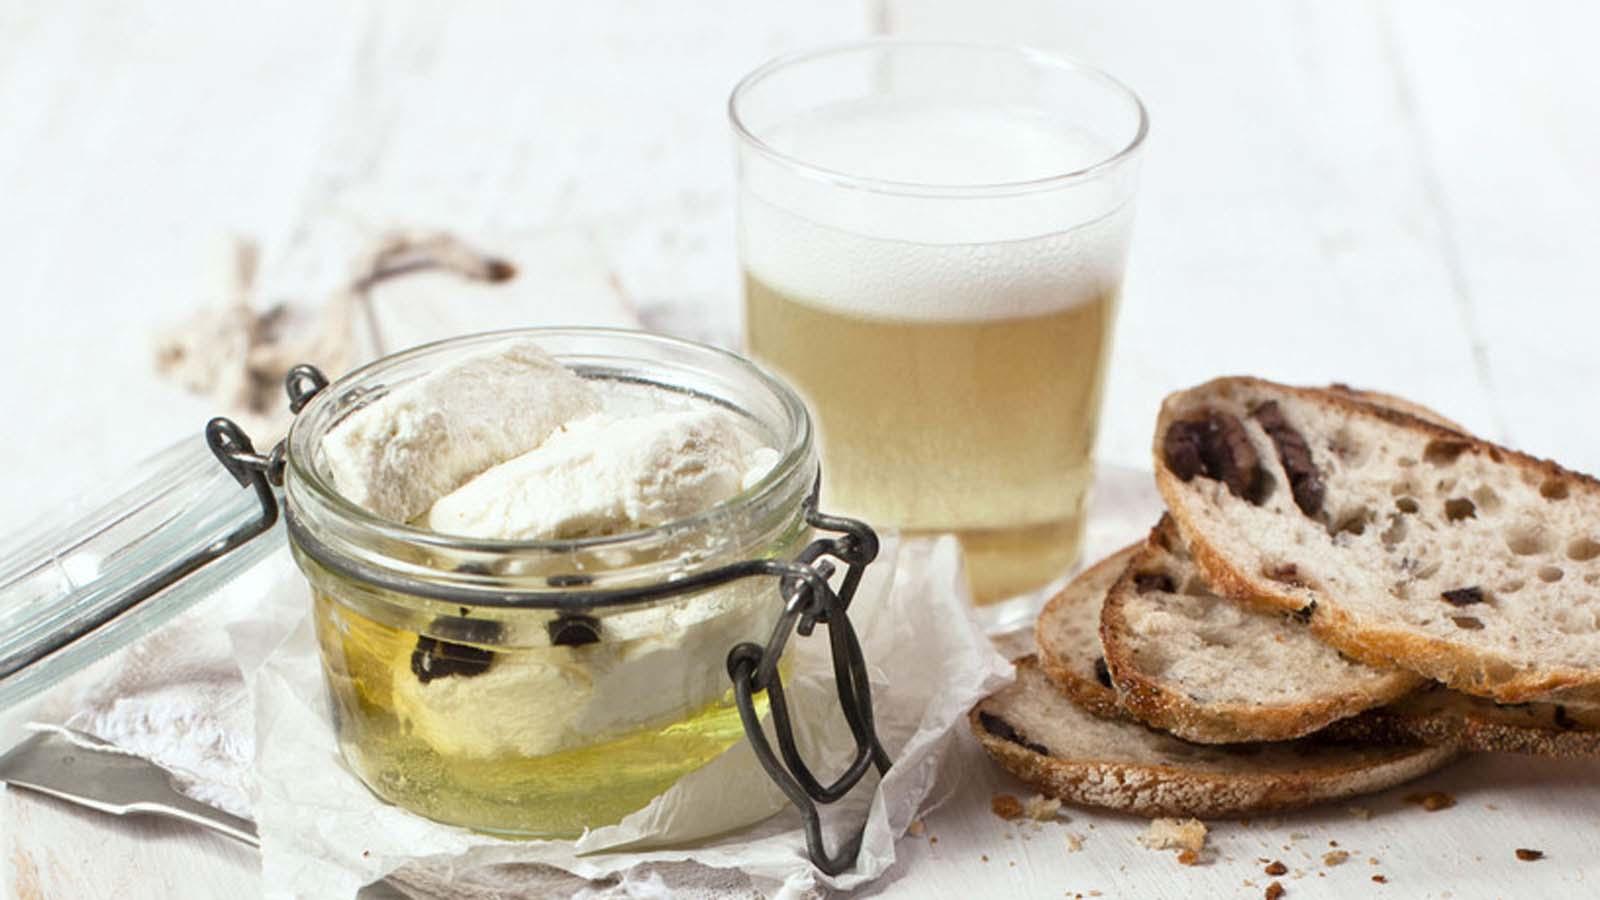 Marinated fetta, olive bread and cider, Yarra Valley, Victoria, Australia. Photo: Katie Quinn Davies